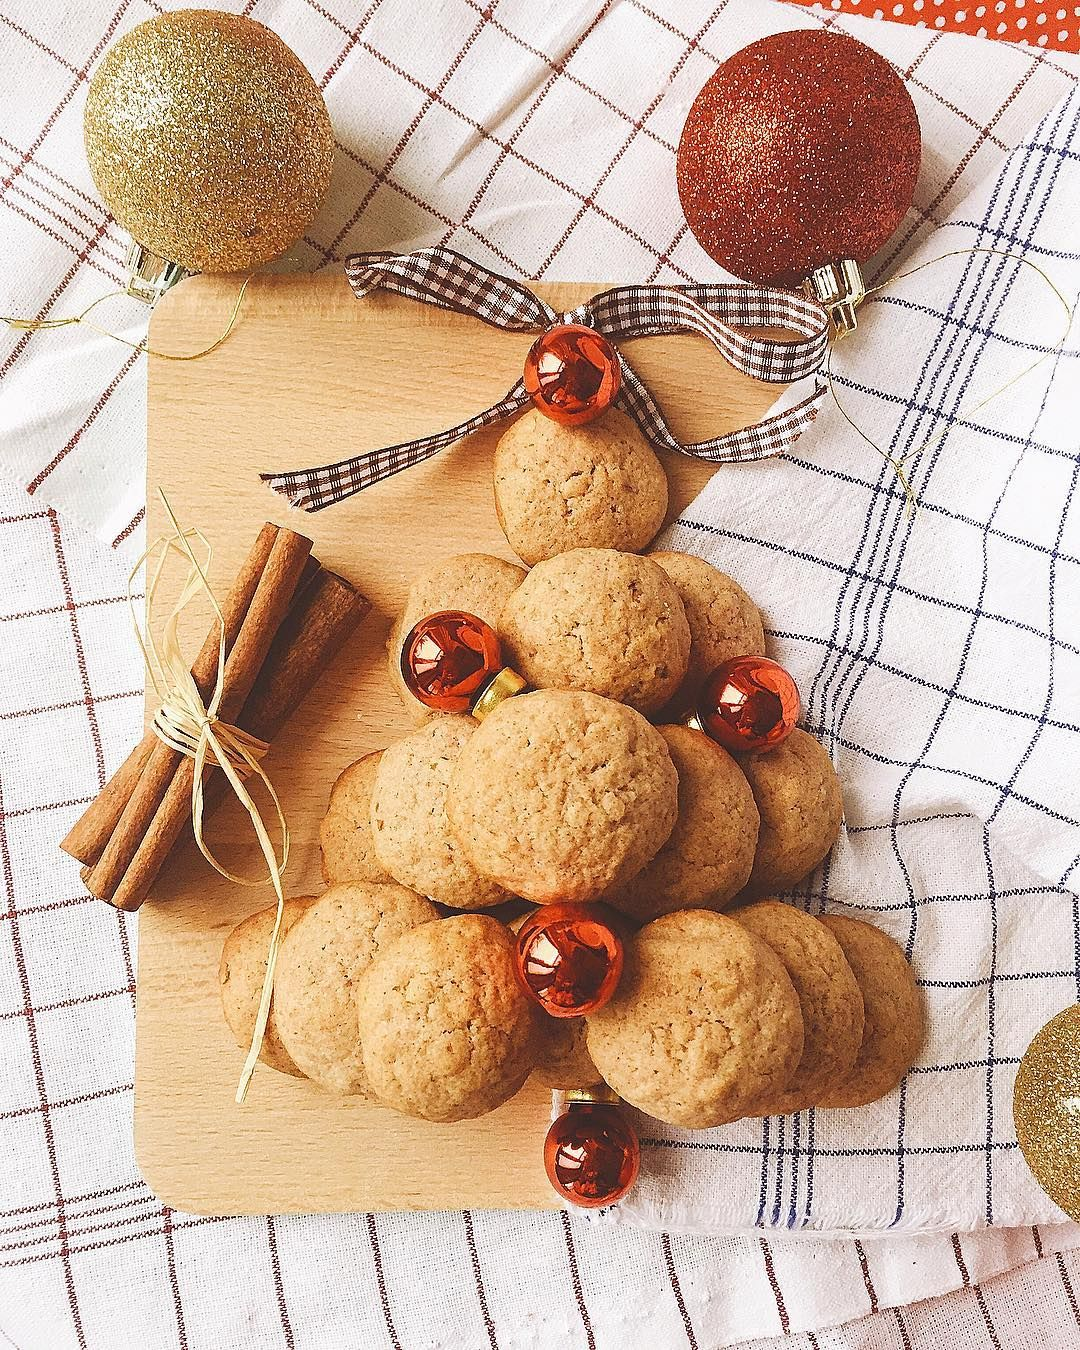 "Tanya Gardzheva on Instagram: ""Елхата от коледни орехови сладки е готова 🎄🍪👌😋#itsthemostwonderfultimeoftheyear #christmas #christmasiscoming #christmasbakes #walnuts…"""